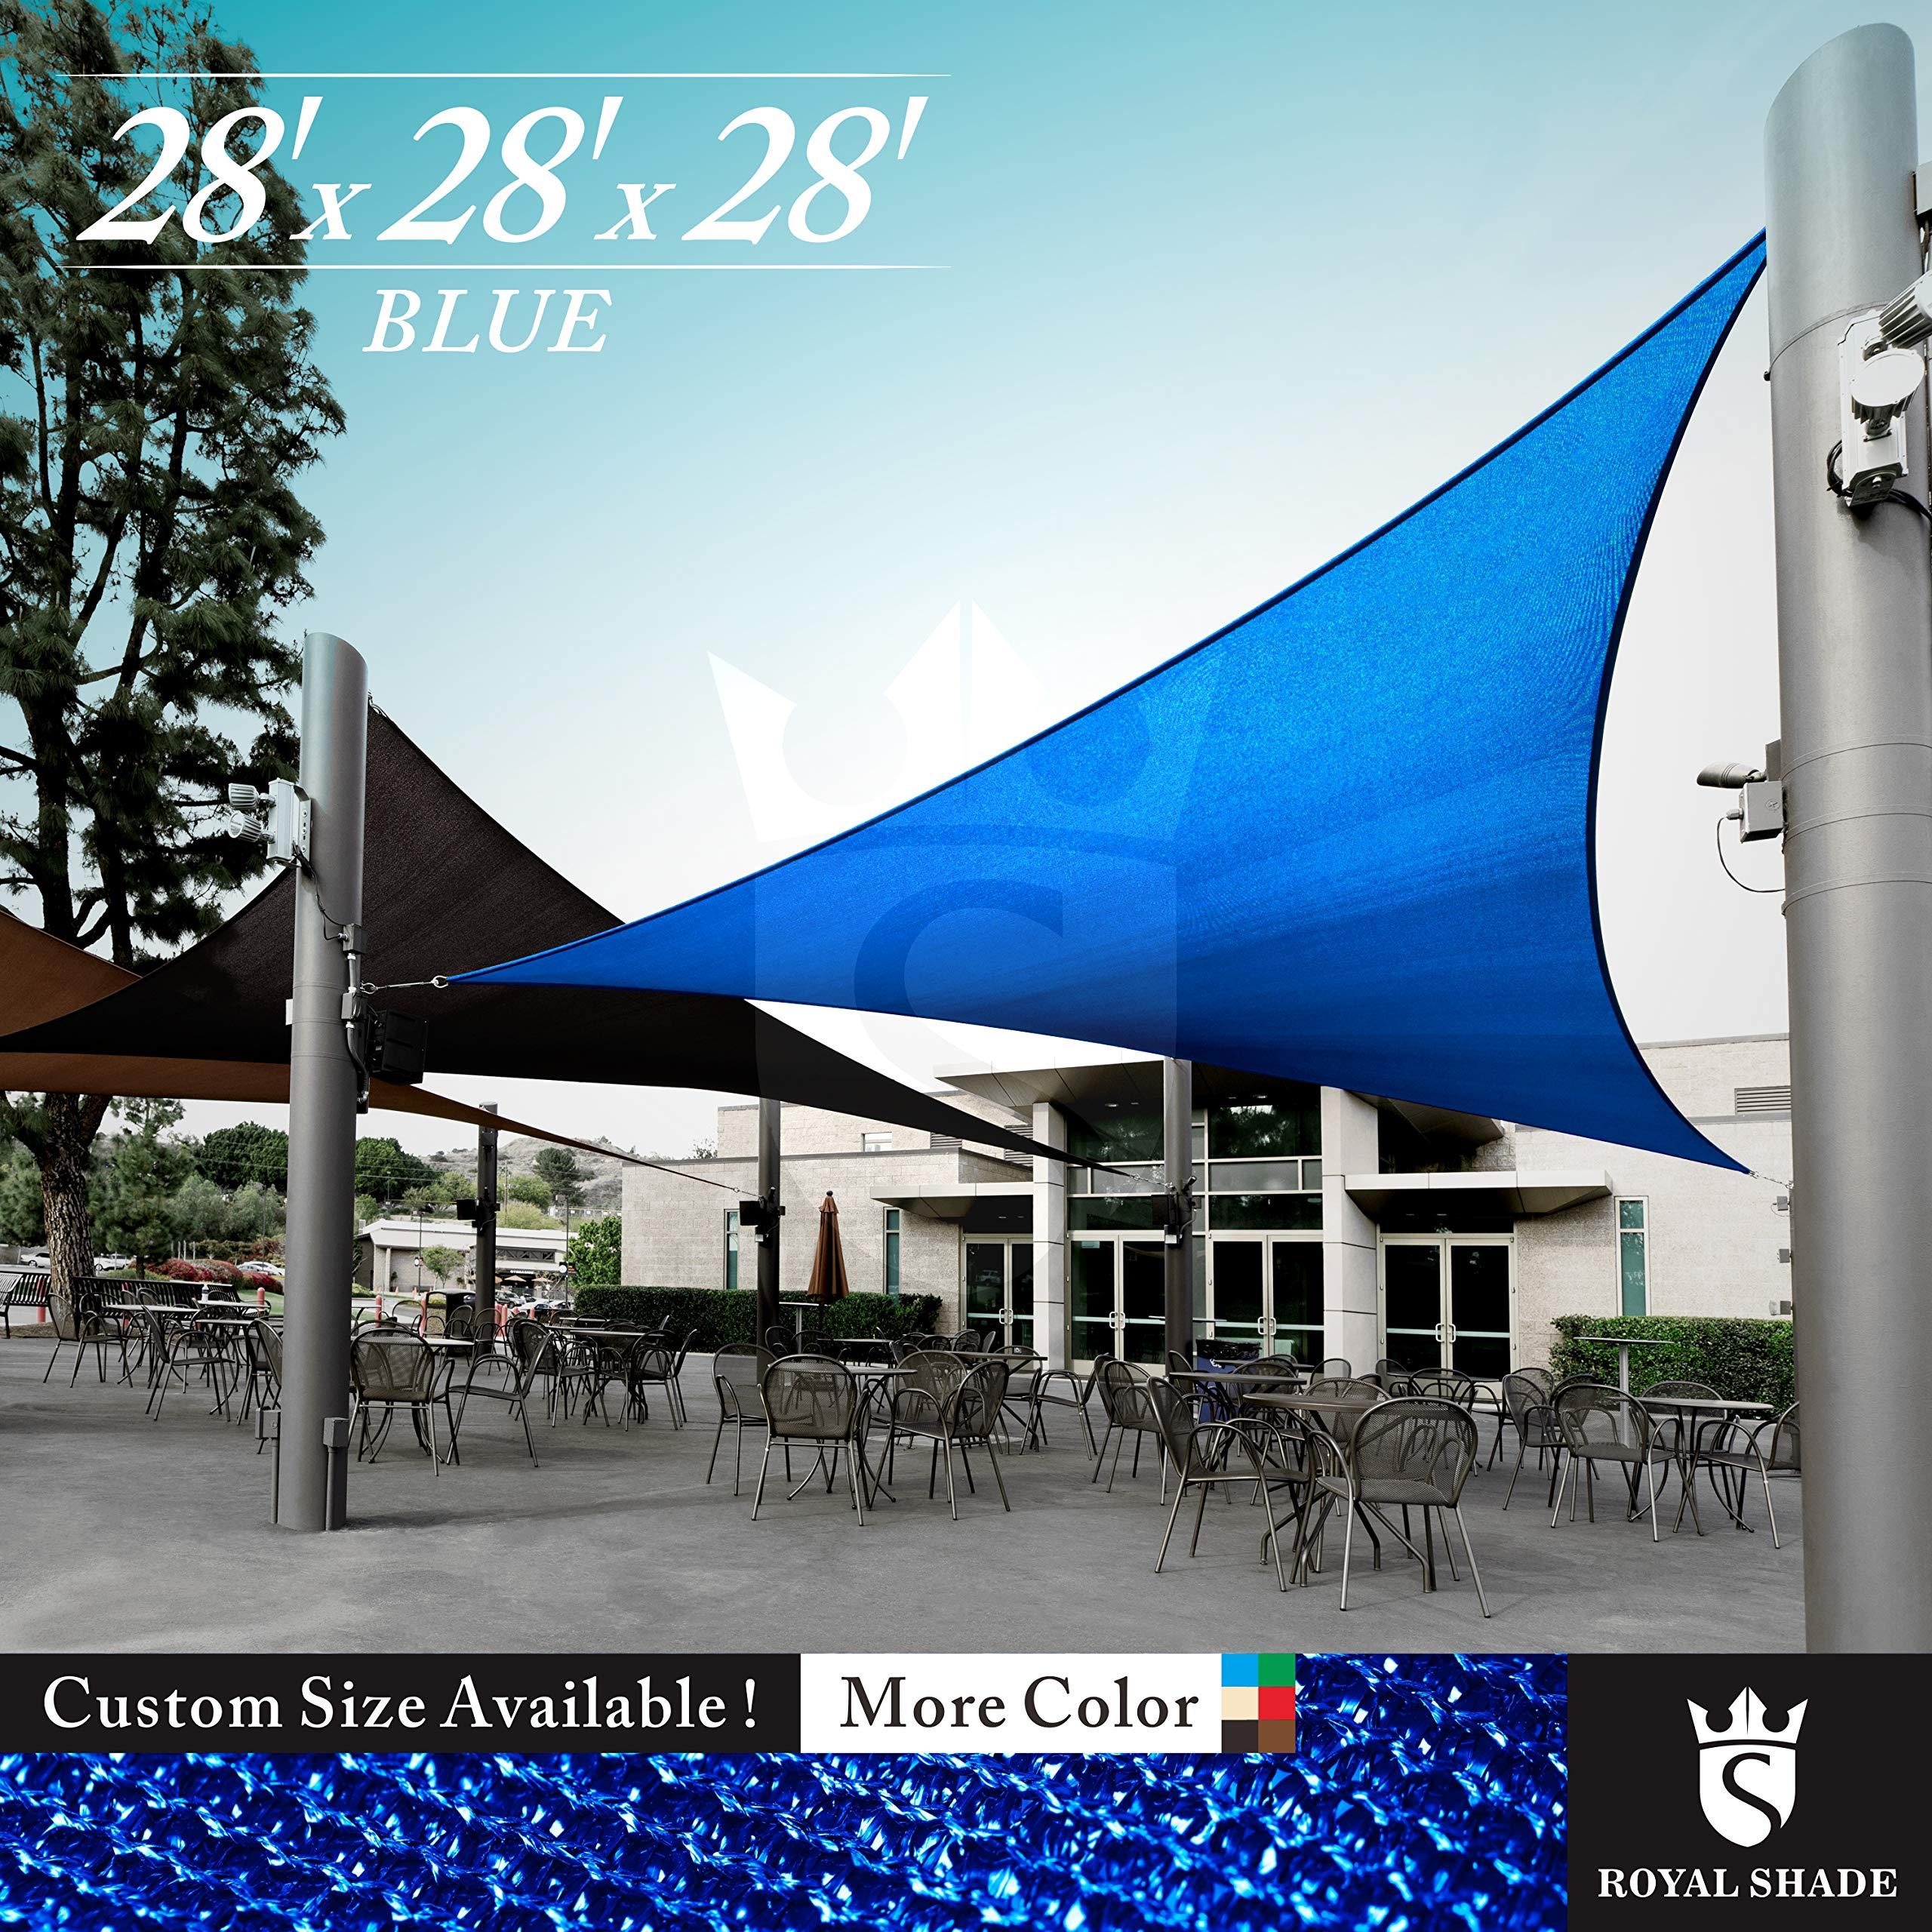 Royal Shade 28' x 28' x 28' Blue Triangle Sun Shade Sail Canopy Outdoor Patio Fabric Shelter Cloth Screen Awning - 95% UV Protection, 200 GSM, Heavy Duty, 5 Years Warranty, We Make Custom Size